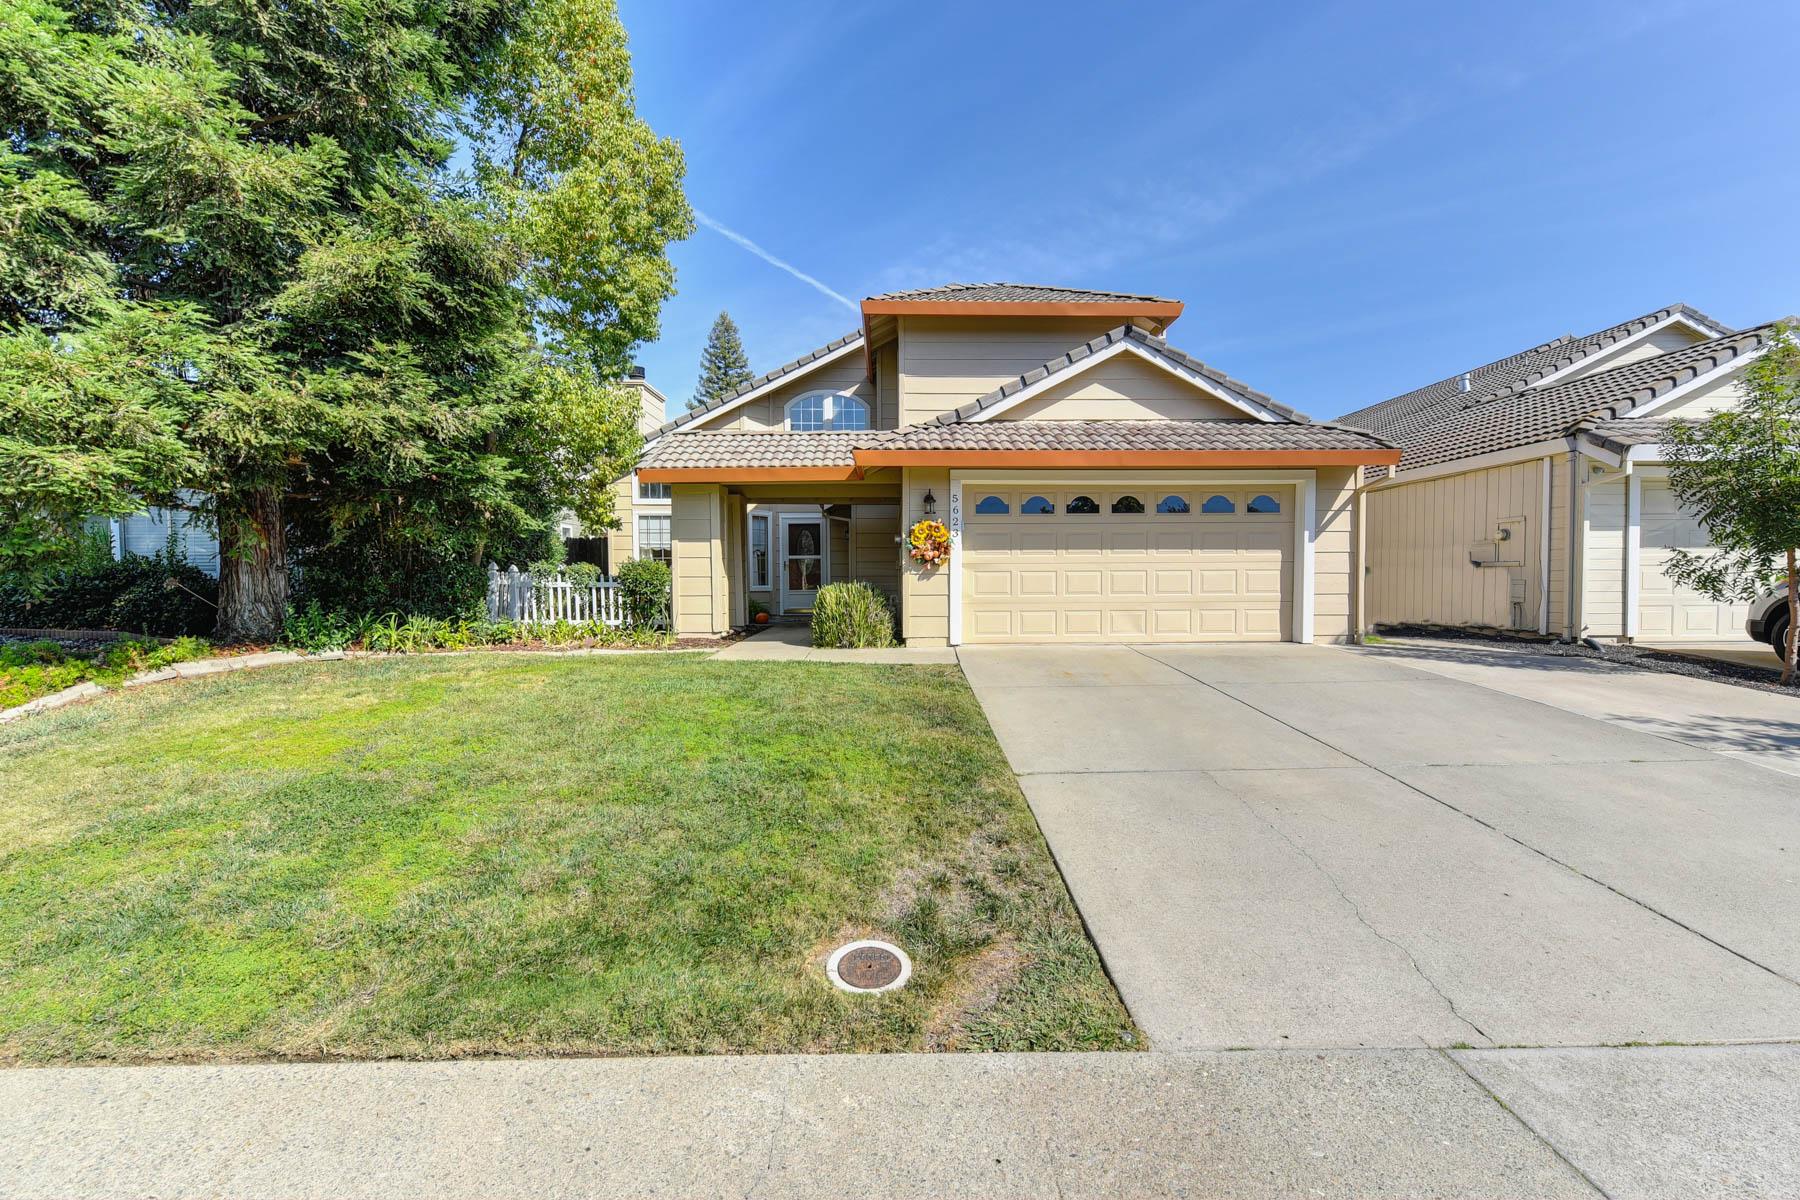 Other Residential Homes for Sale at 5623 Delano, Rocklin, CA, 95677 5623 Delano Rocklin, California 95677 United States